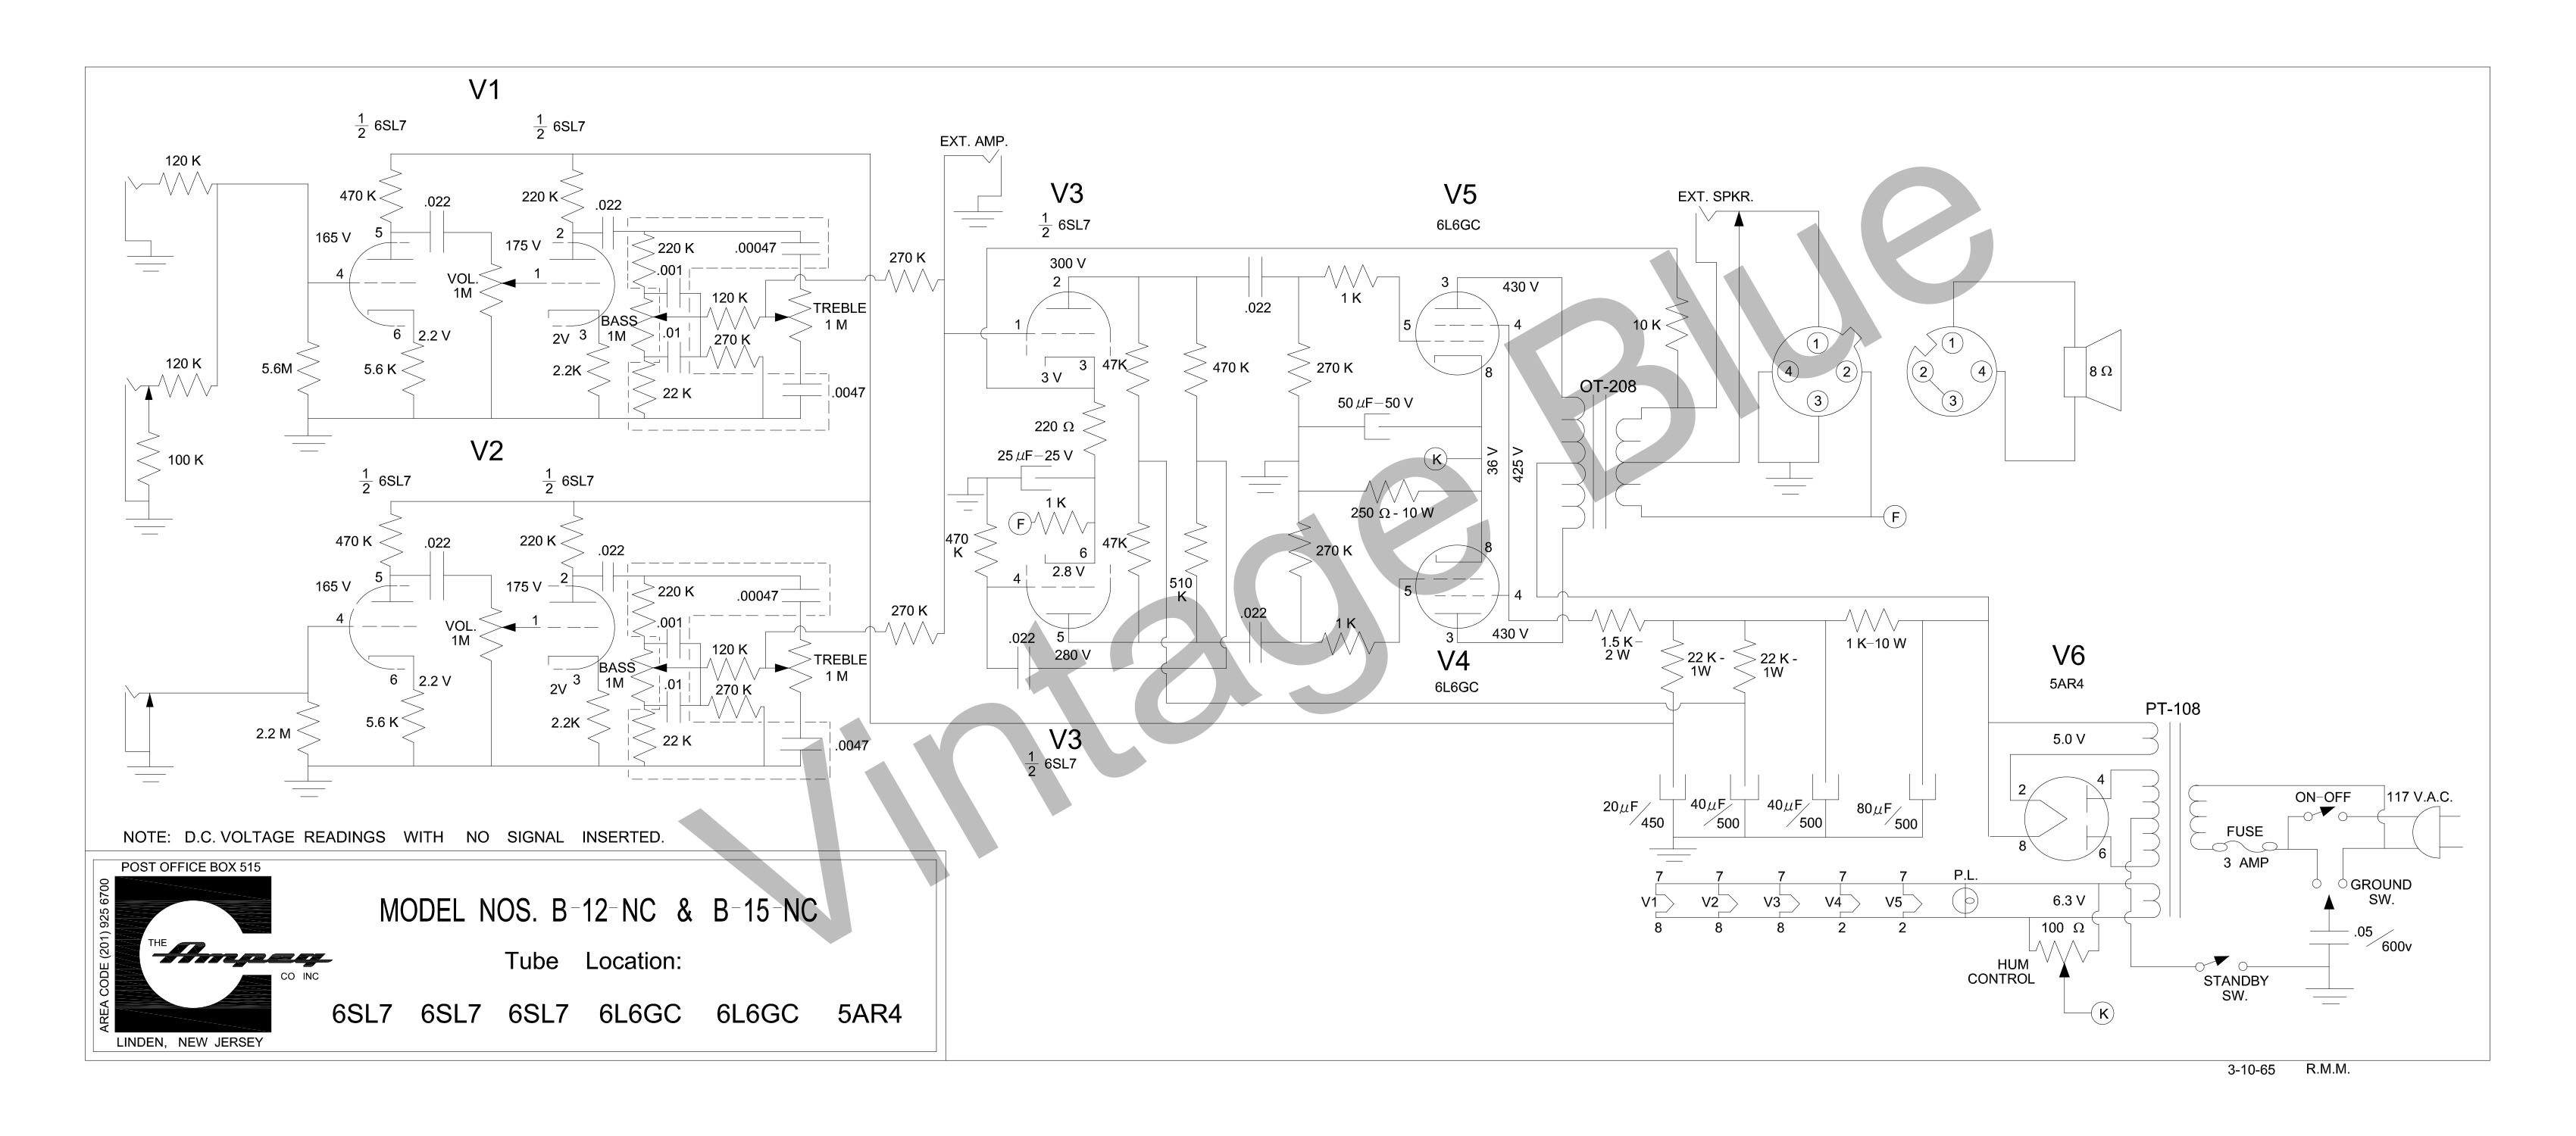 826 International Tractor Wiring Schematic Auto Electrical Ih 1486 Diagram 966 Alternator Farmall 806 Elsalvadorla 1256